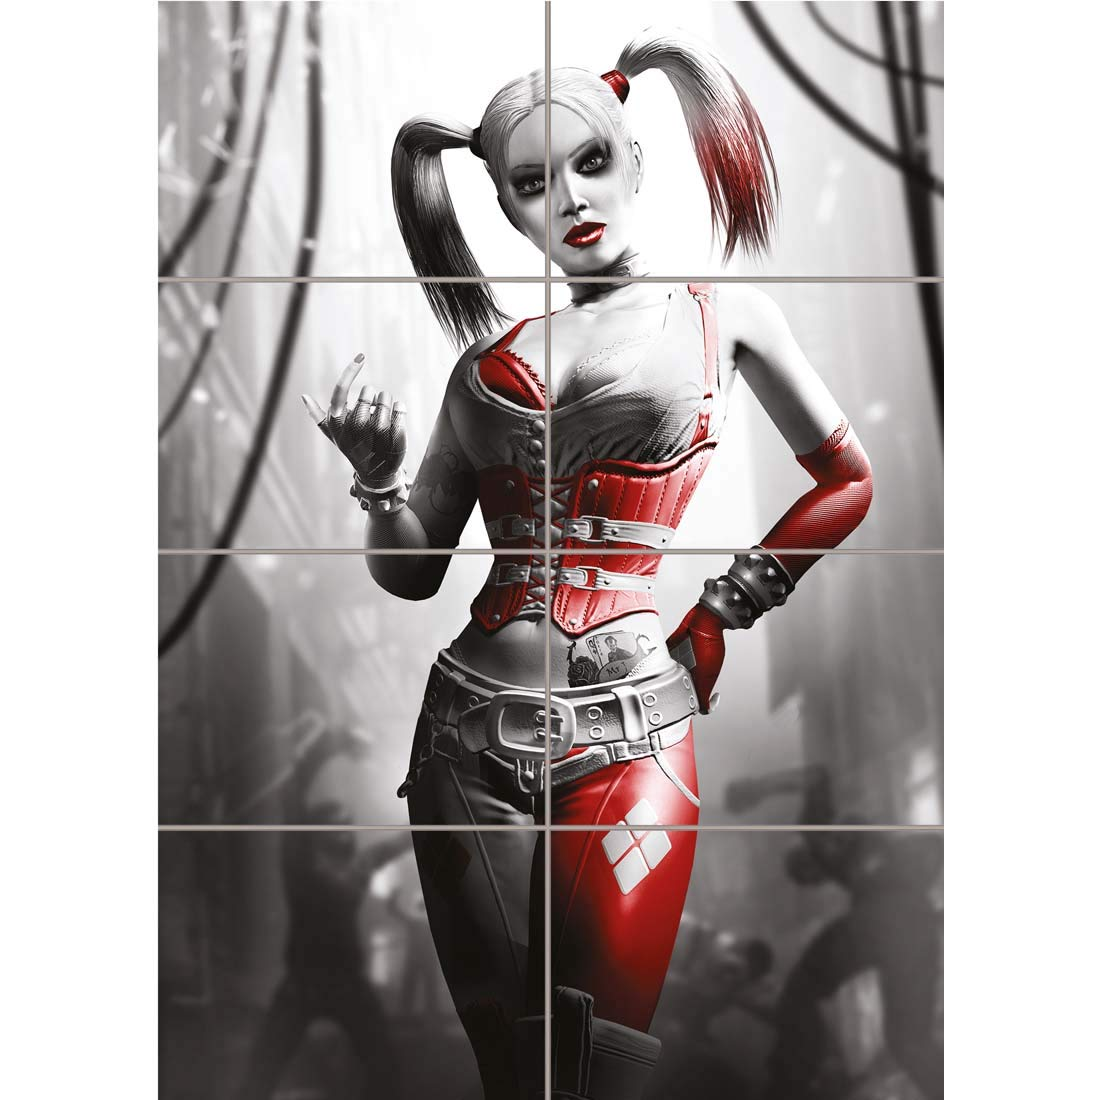 Doppelganger33 LTD Harley Quinn Batman Arkham City New Giant Wall Art Print Picture Poster OZ251